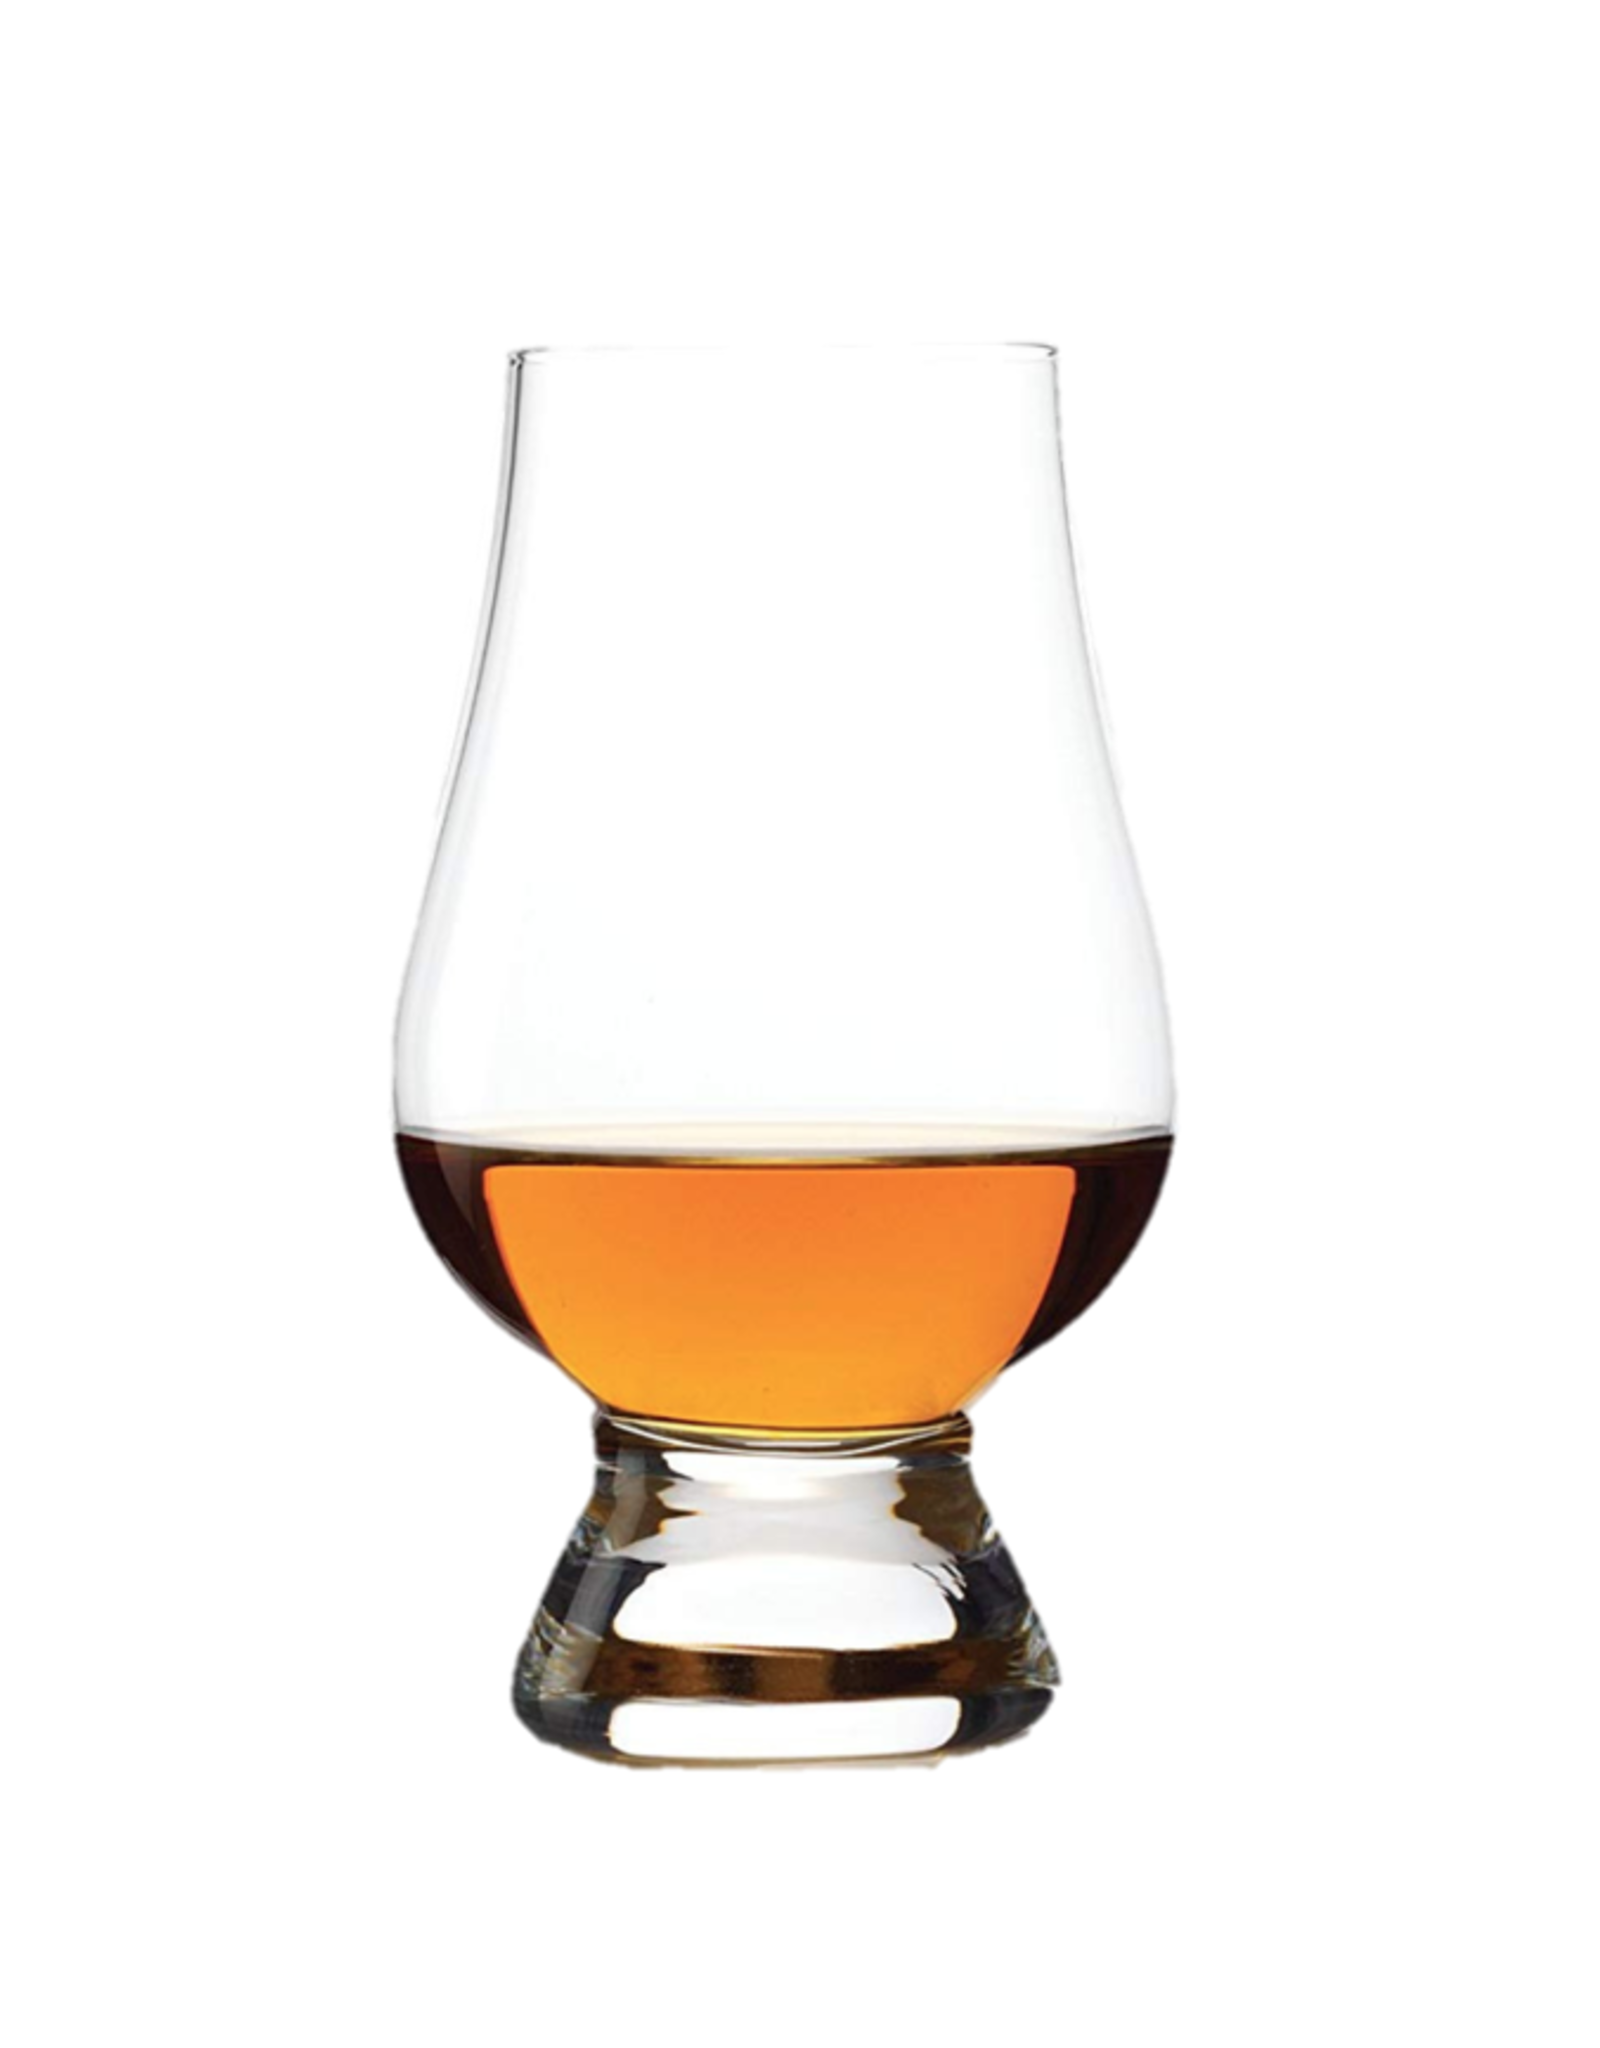 ICM - Glencairn Glass/Scotch & Whiskey Snifter, 200ml